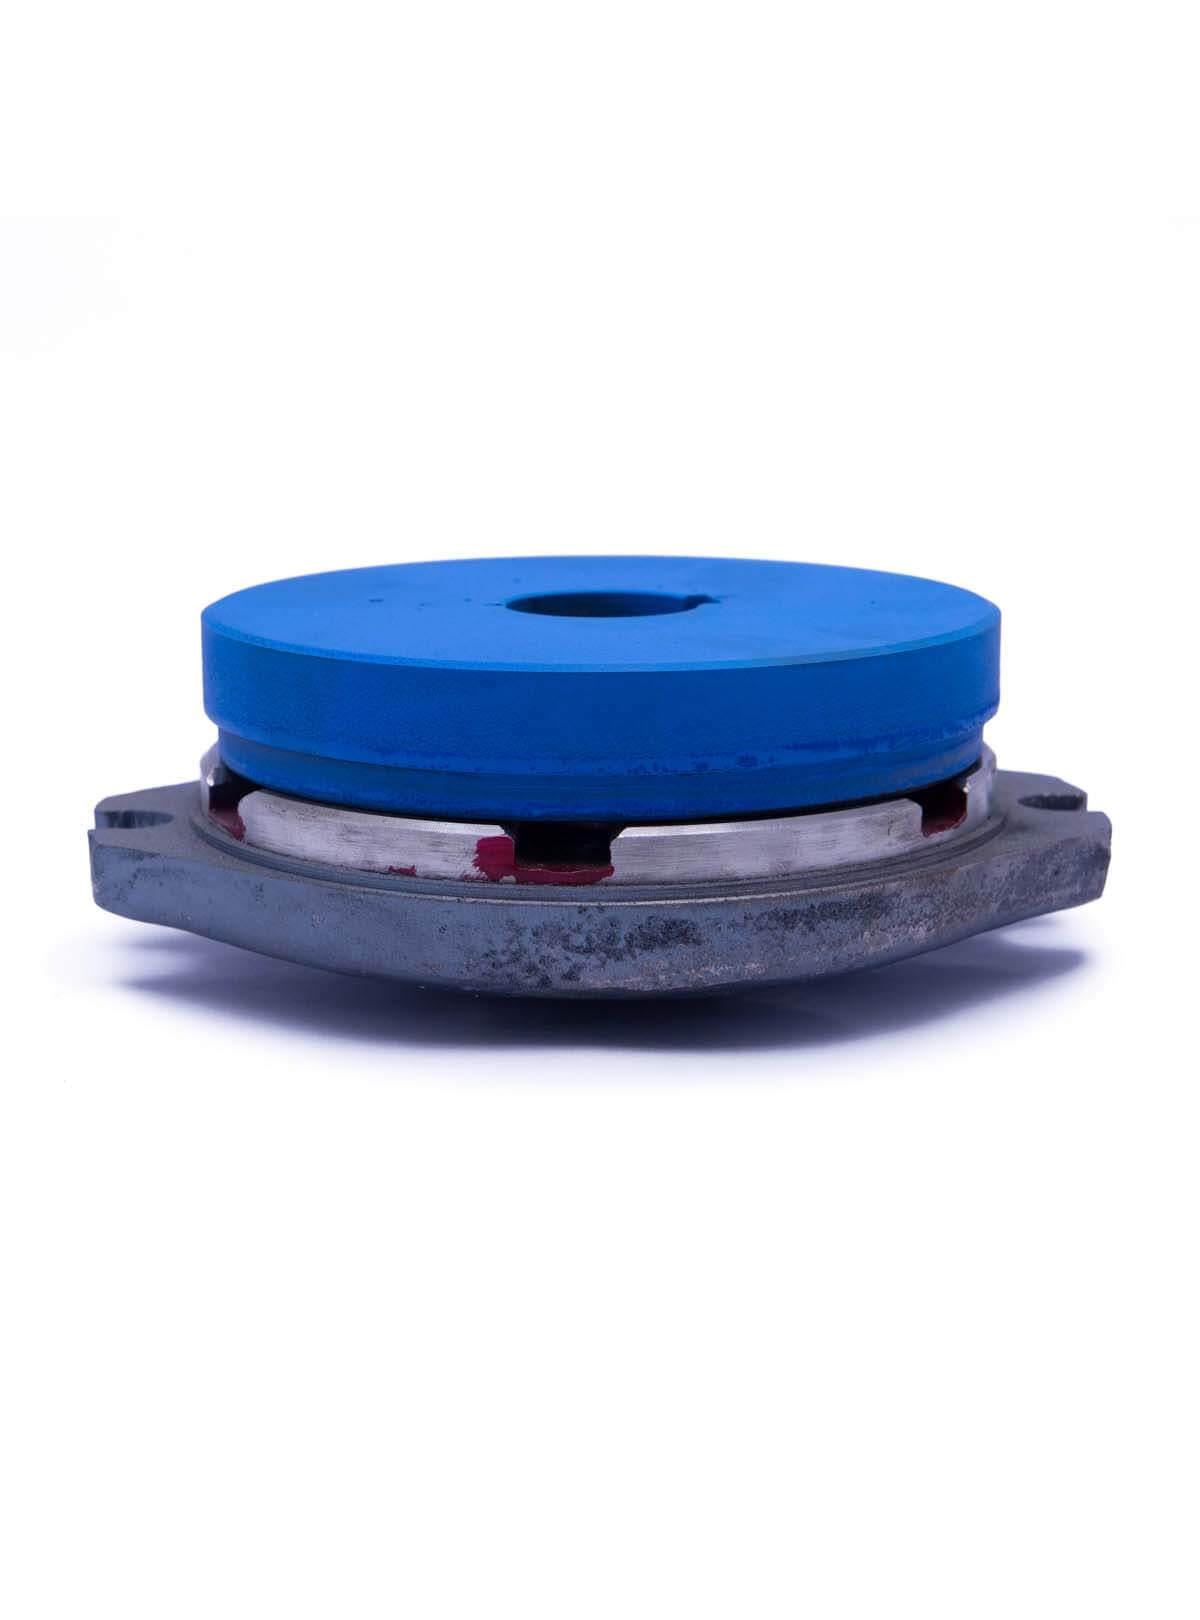 Submersible Thrust Plate Bearing Set For Calama Pumps